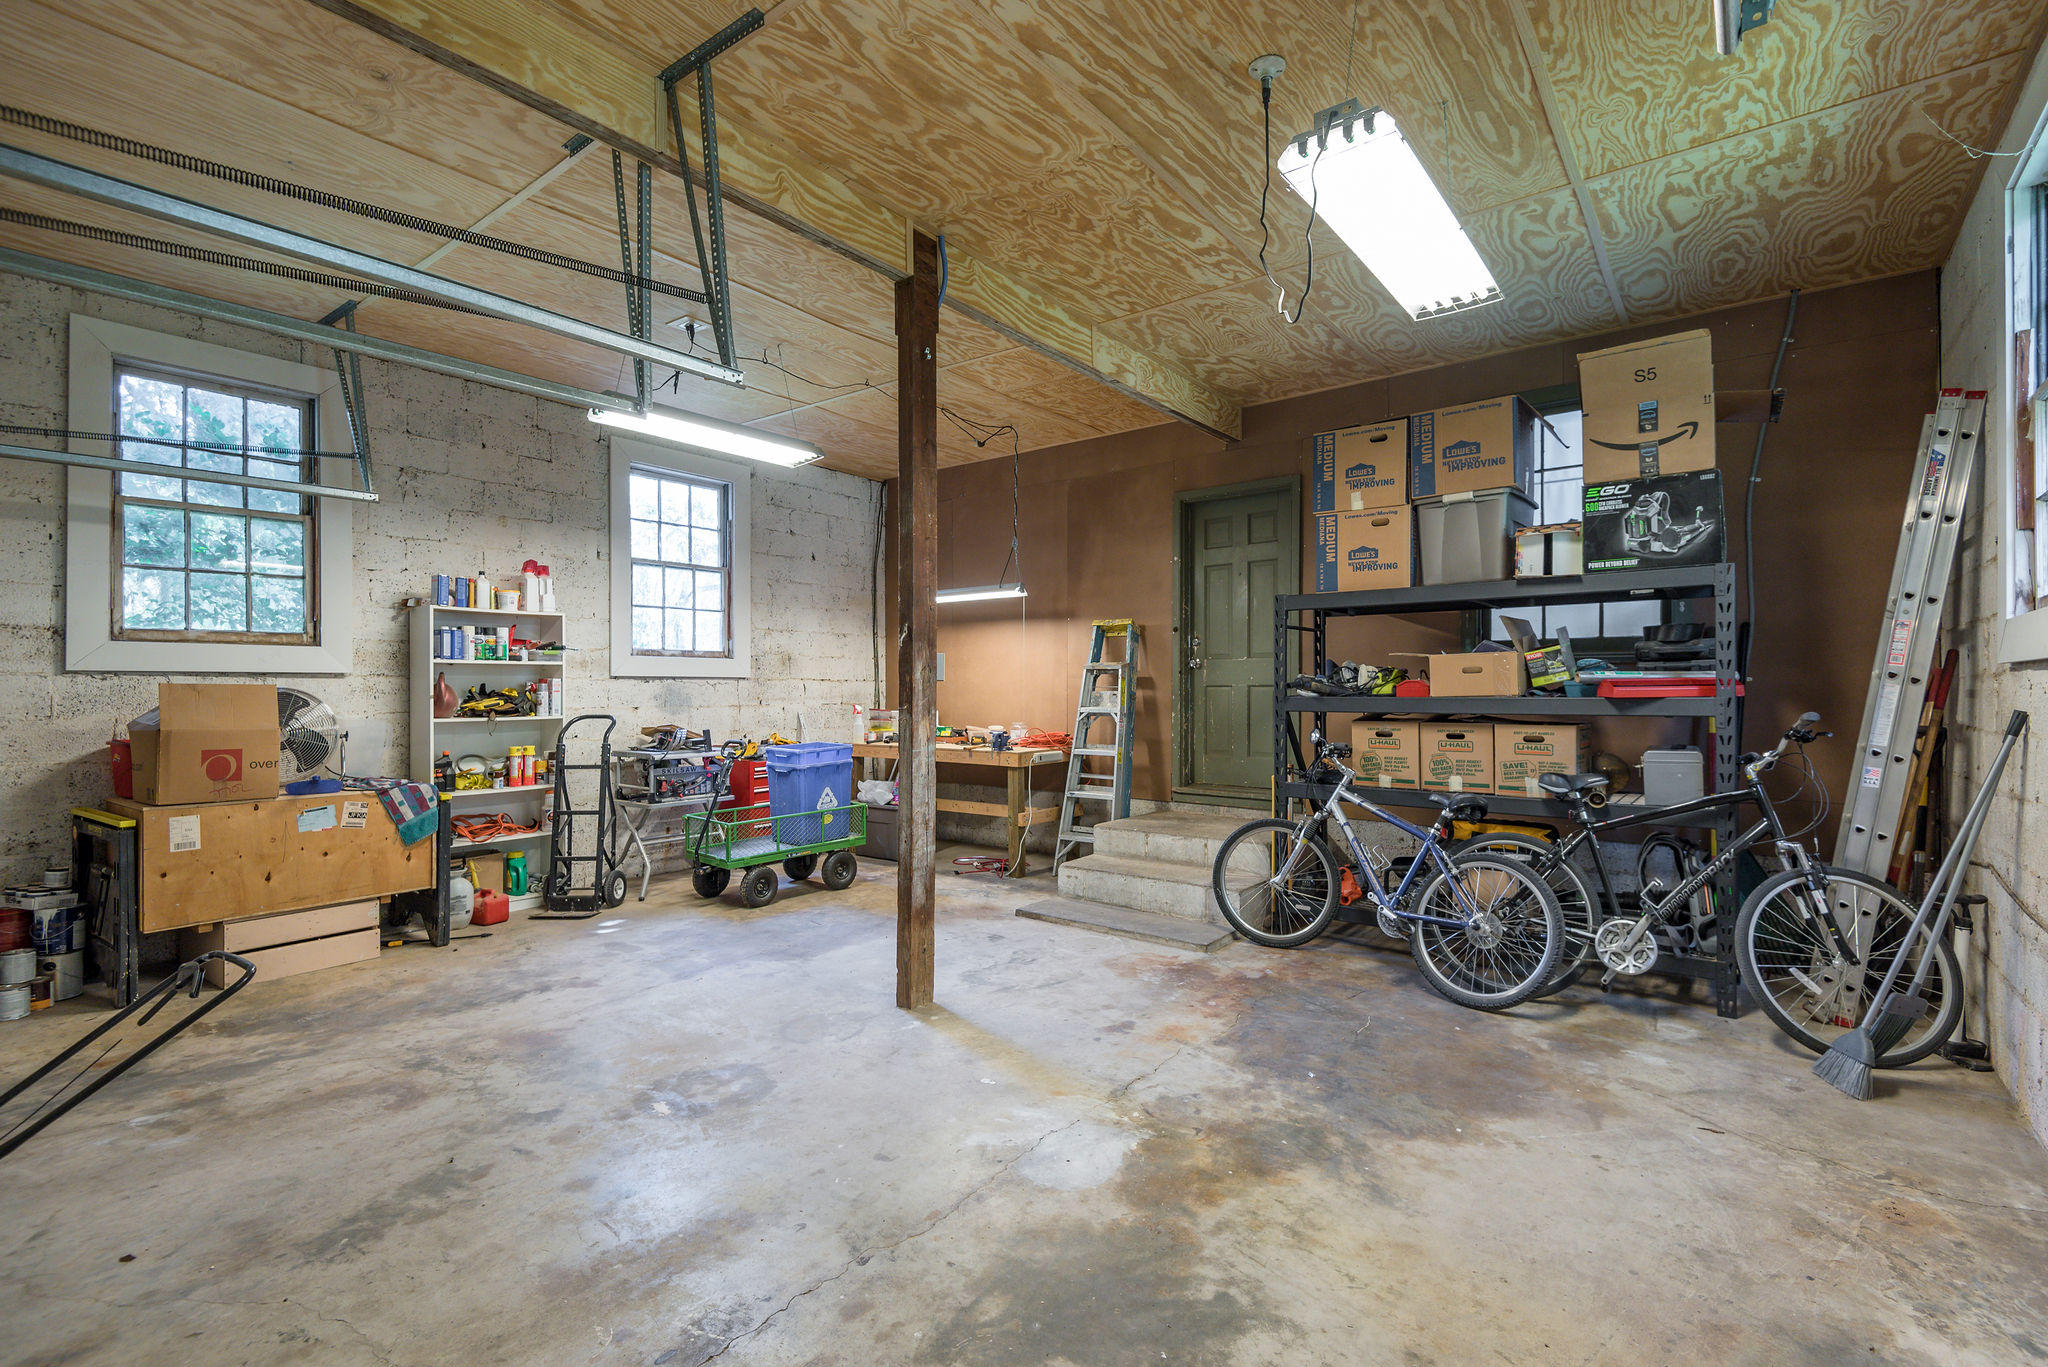 Sylvan Shores Homes For Sale - 450 Polony, Charleston, SC - 18